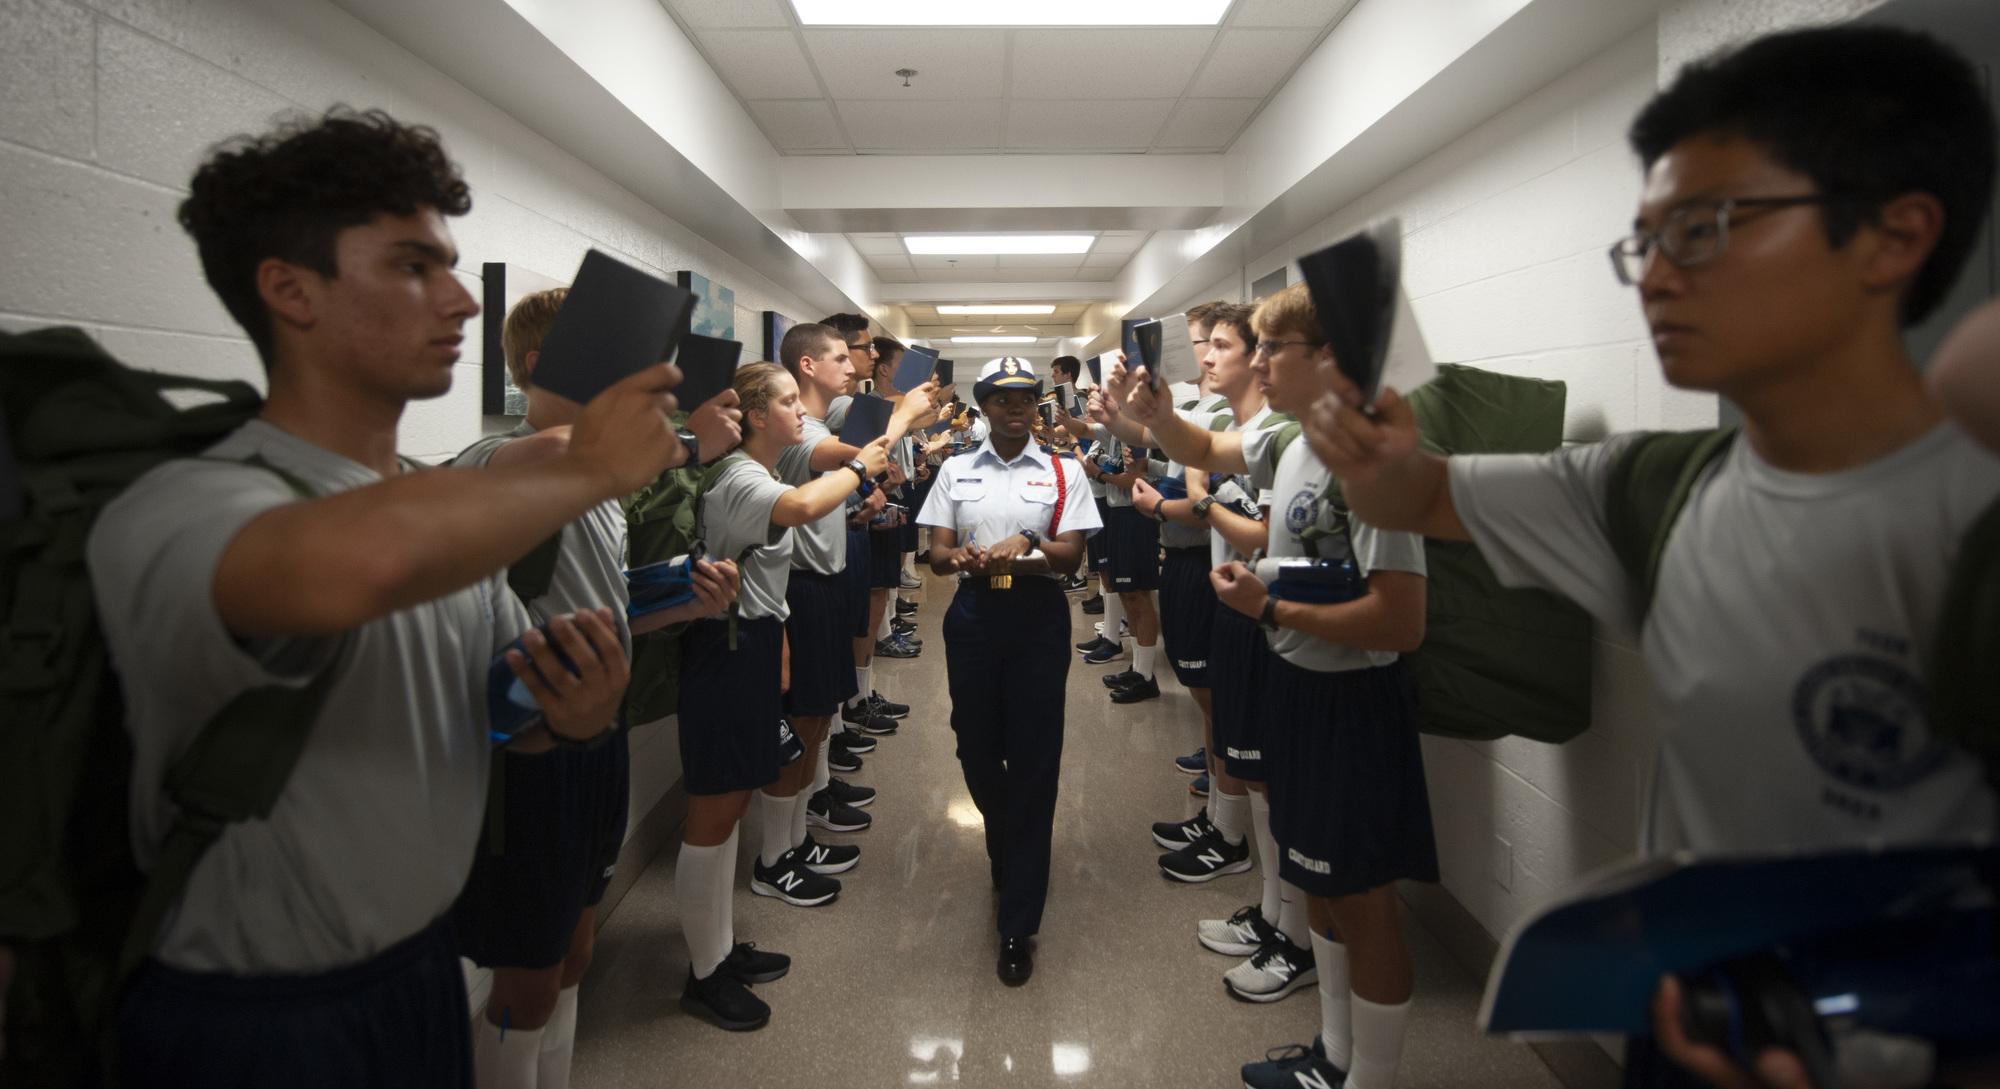 U.S. Coast Guard Academy welcomes Class of 2023